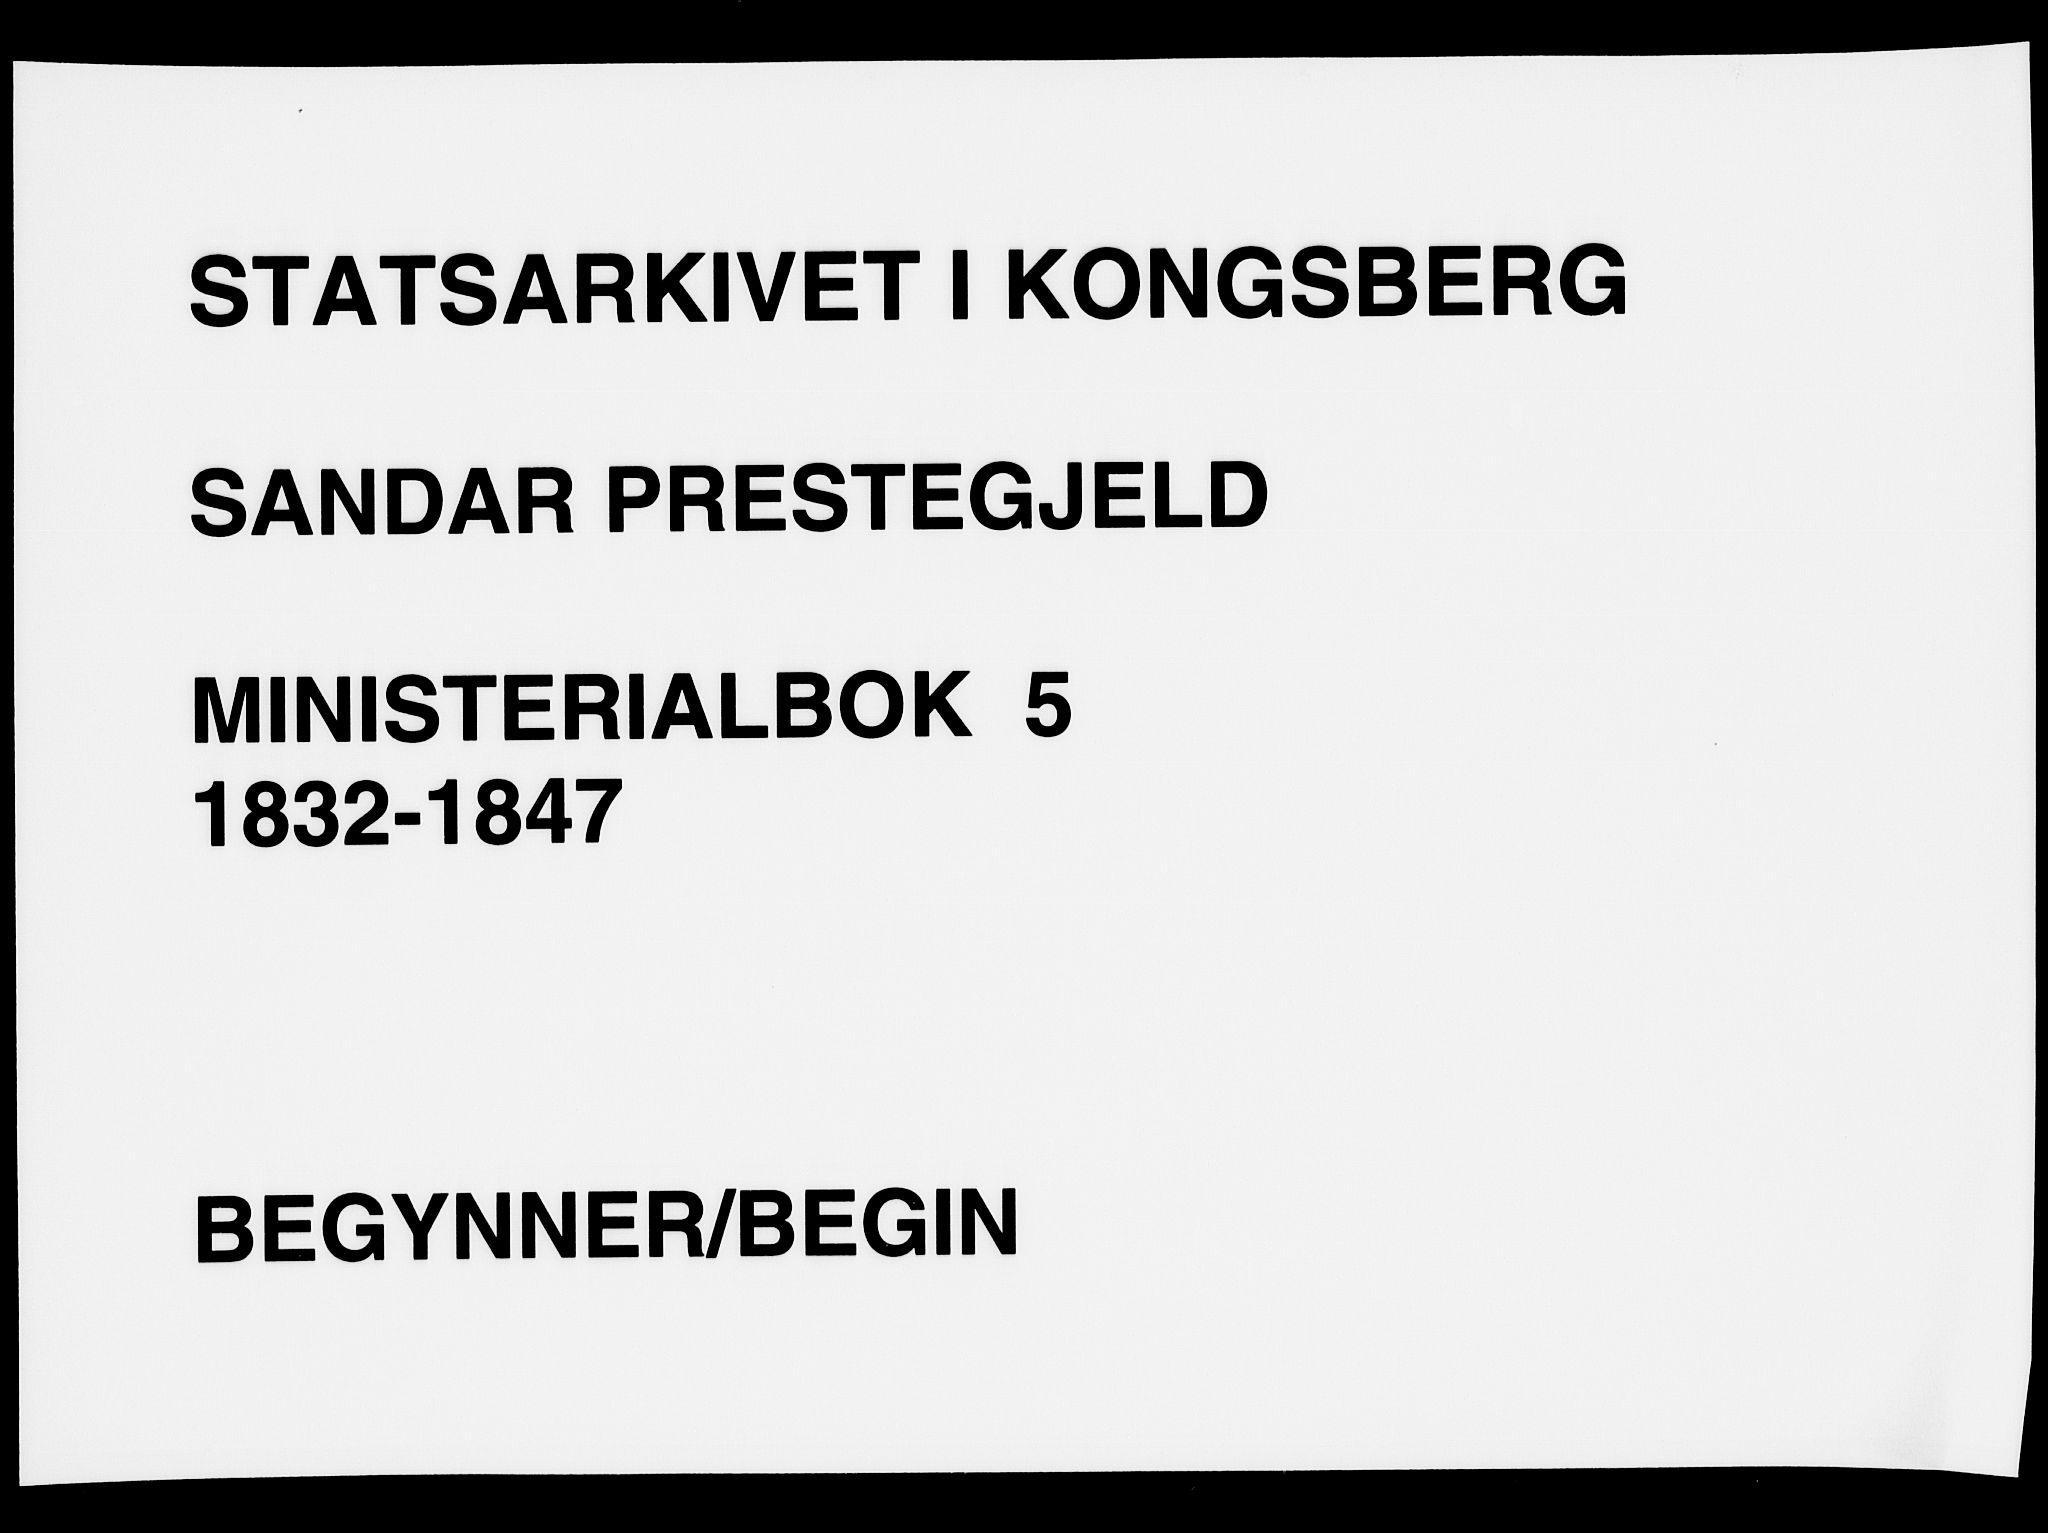 SAKO, Sandar kirkebøker, F/Fa/L0005: Parish register (official) no. 5, 1832-1847